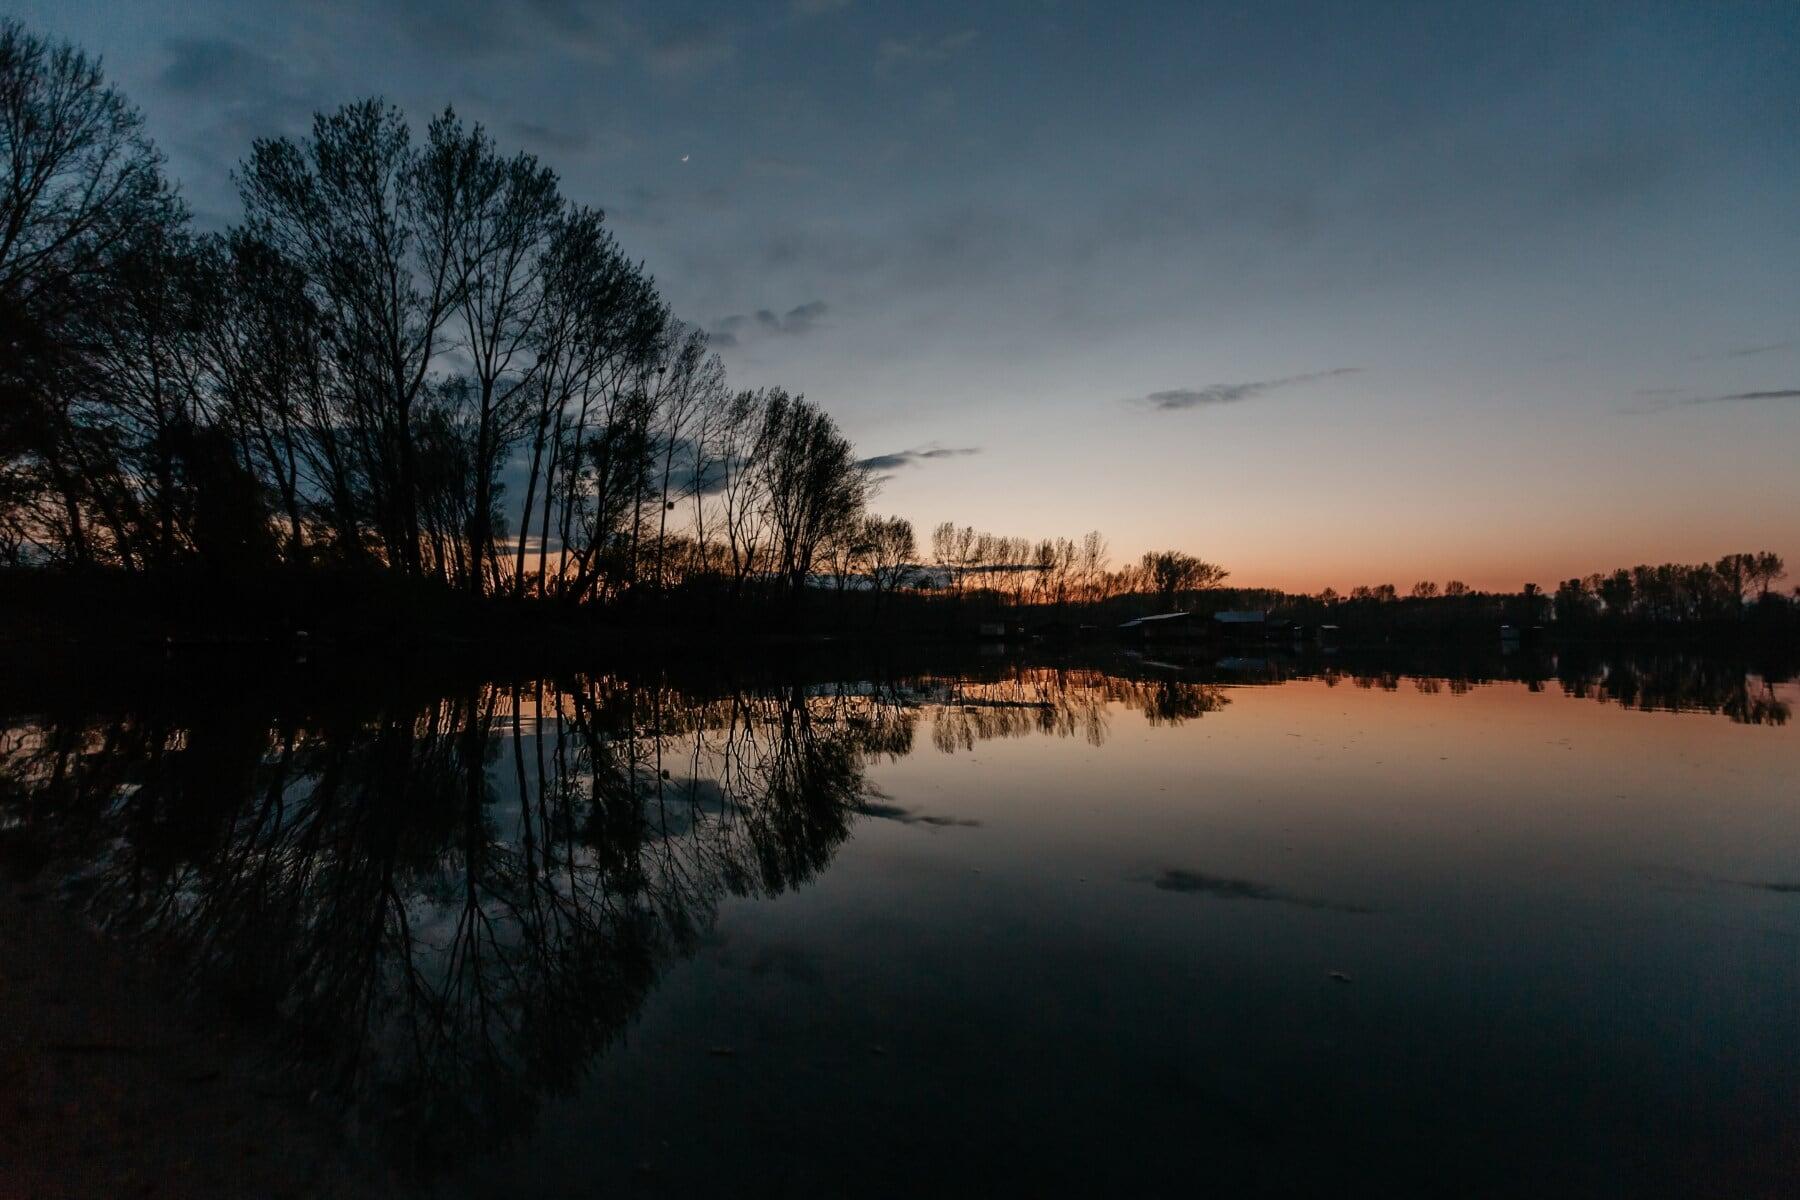 evening, sunset, lake, water, shore, lakeside, atmosphere, landscape, reflection, dawn